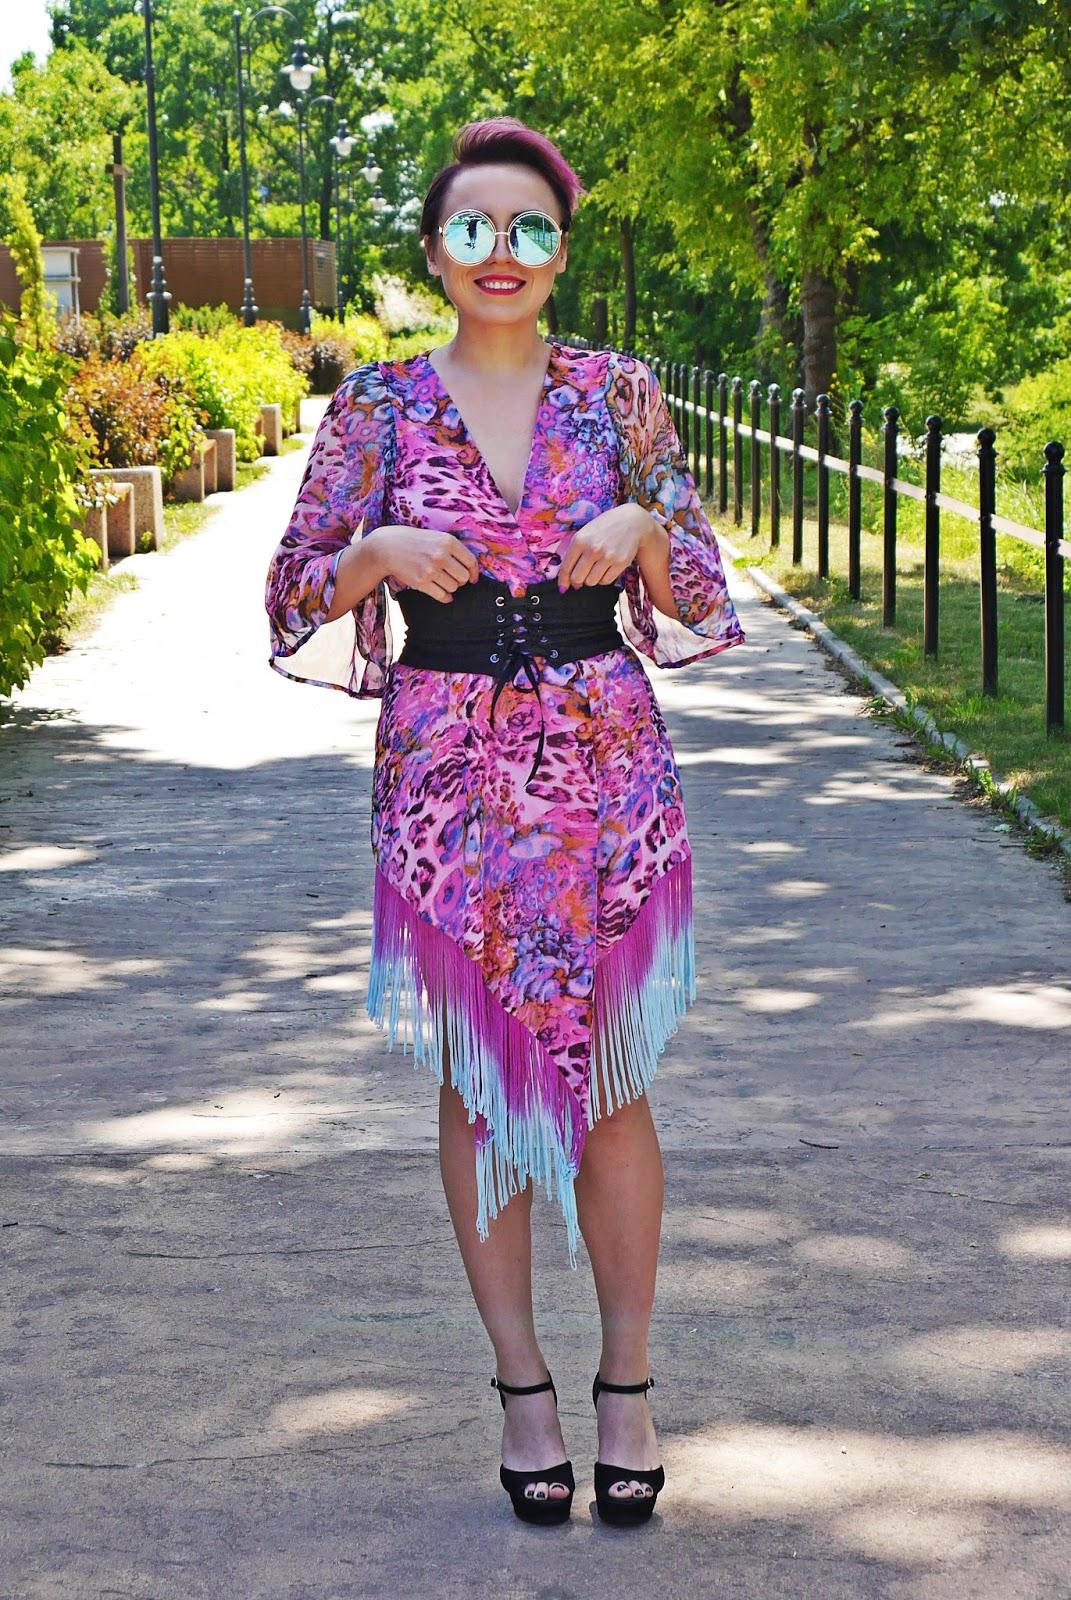 pink_kimonos_corset_belt_black_block_heels_karyn_blg_modowy_150617b